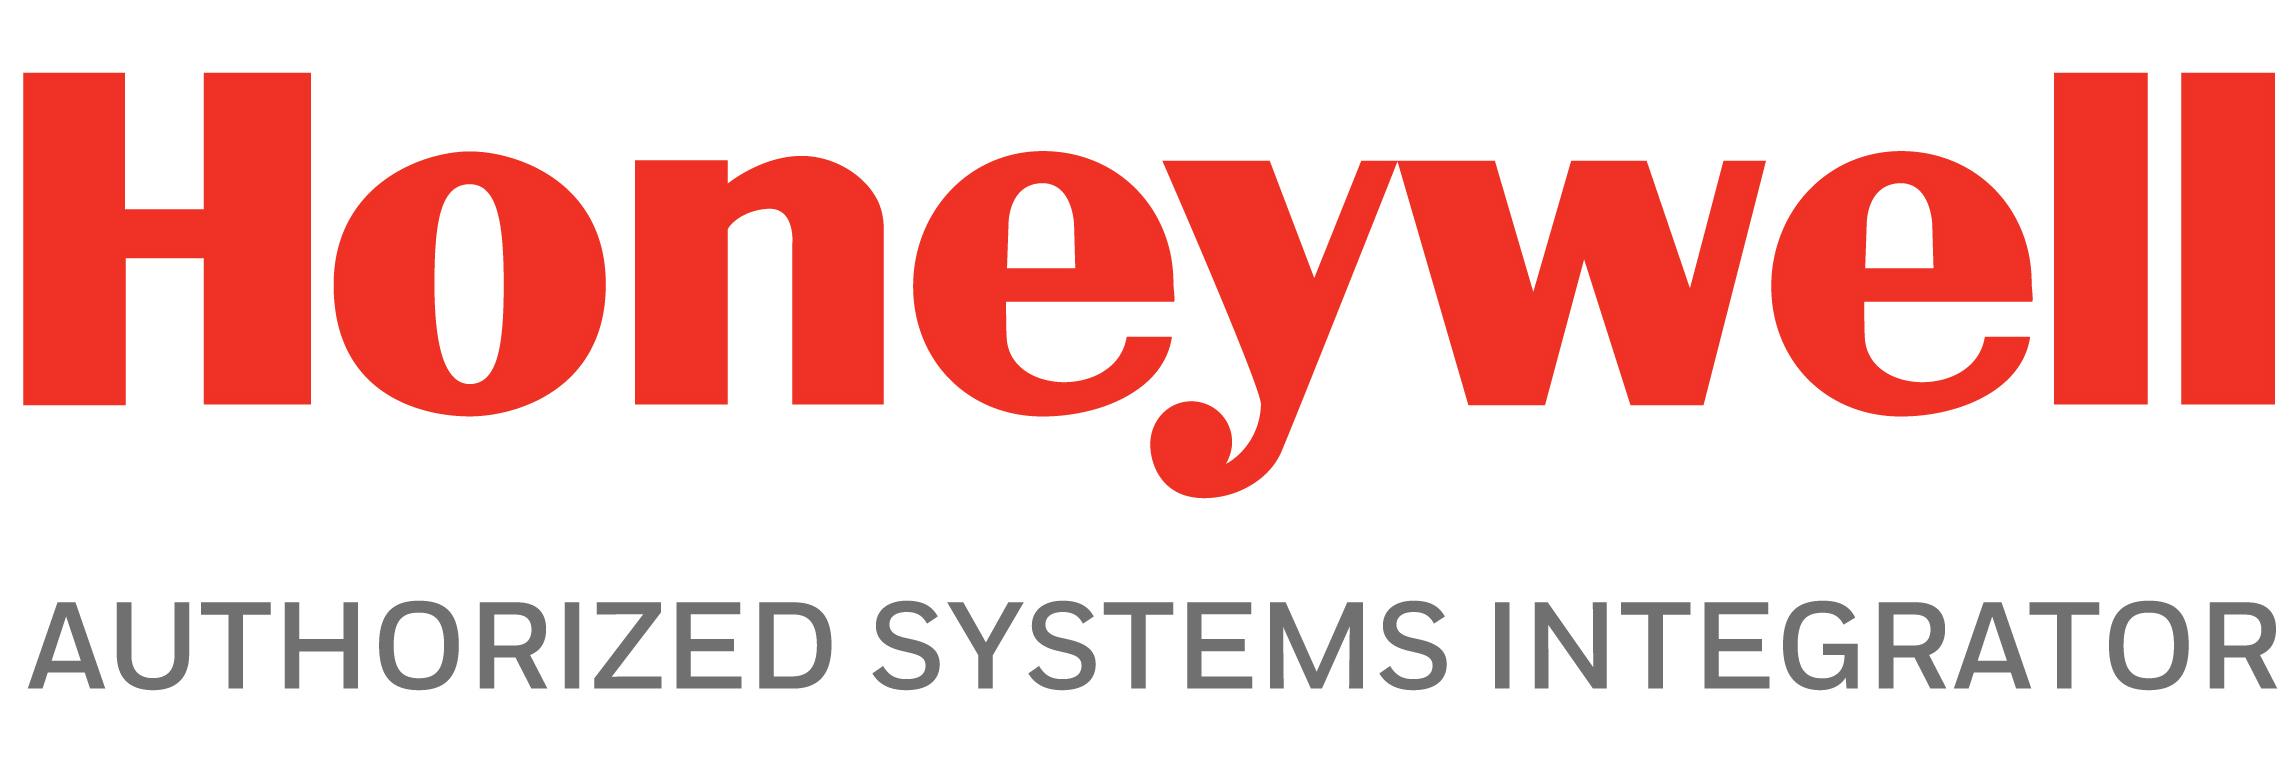 honeywell授权logo